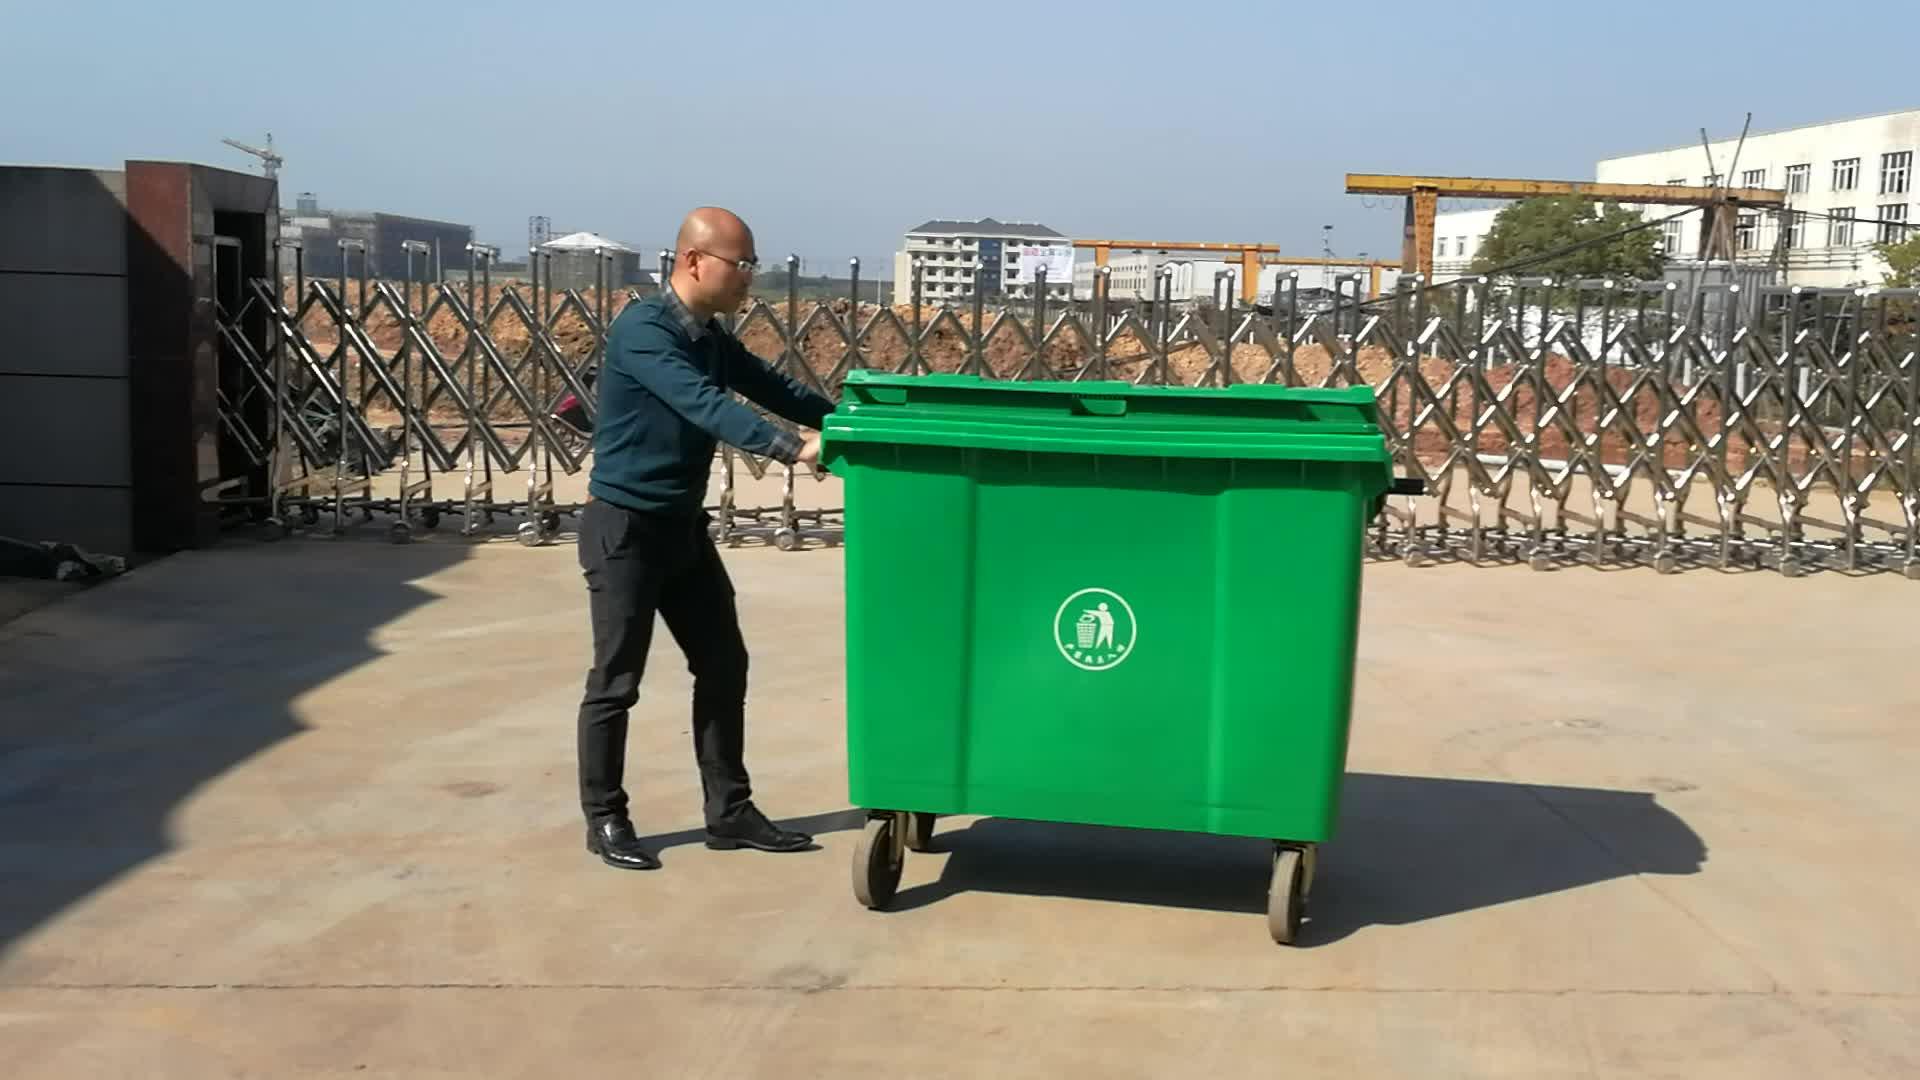 Abfall bin EN840 übereinstimmung HDPE 660 liter mülleimer